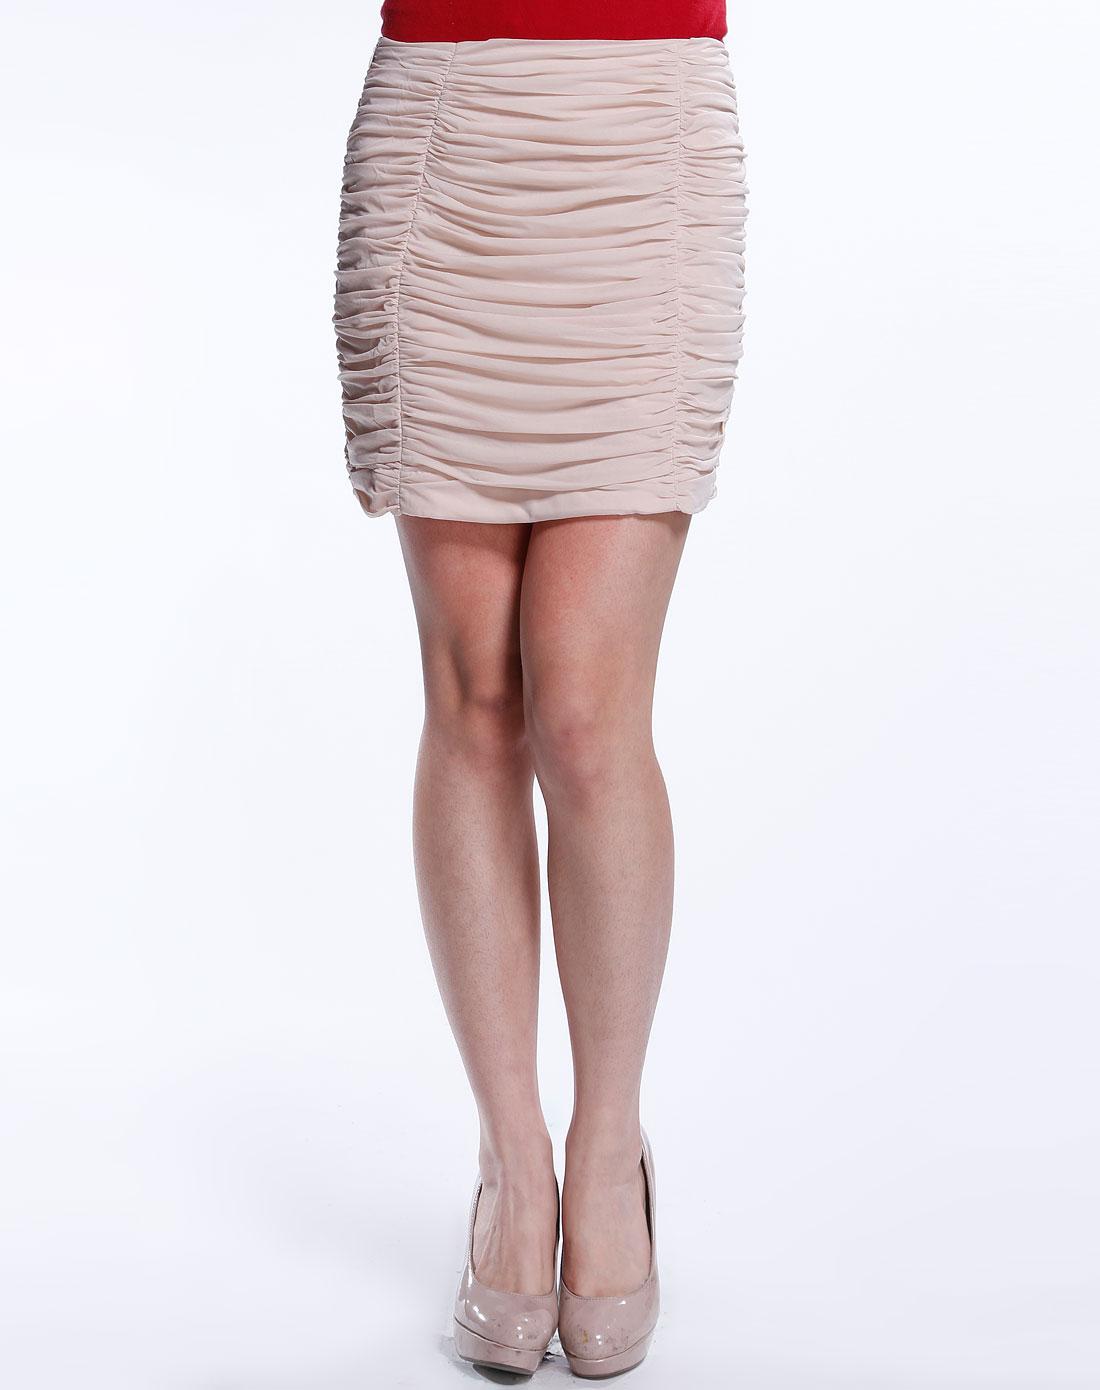 elle卡其色优雅短裙113180105674